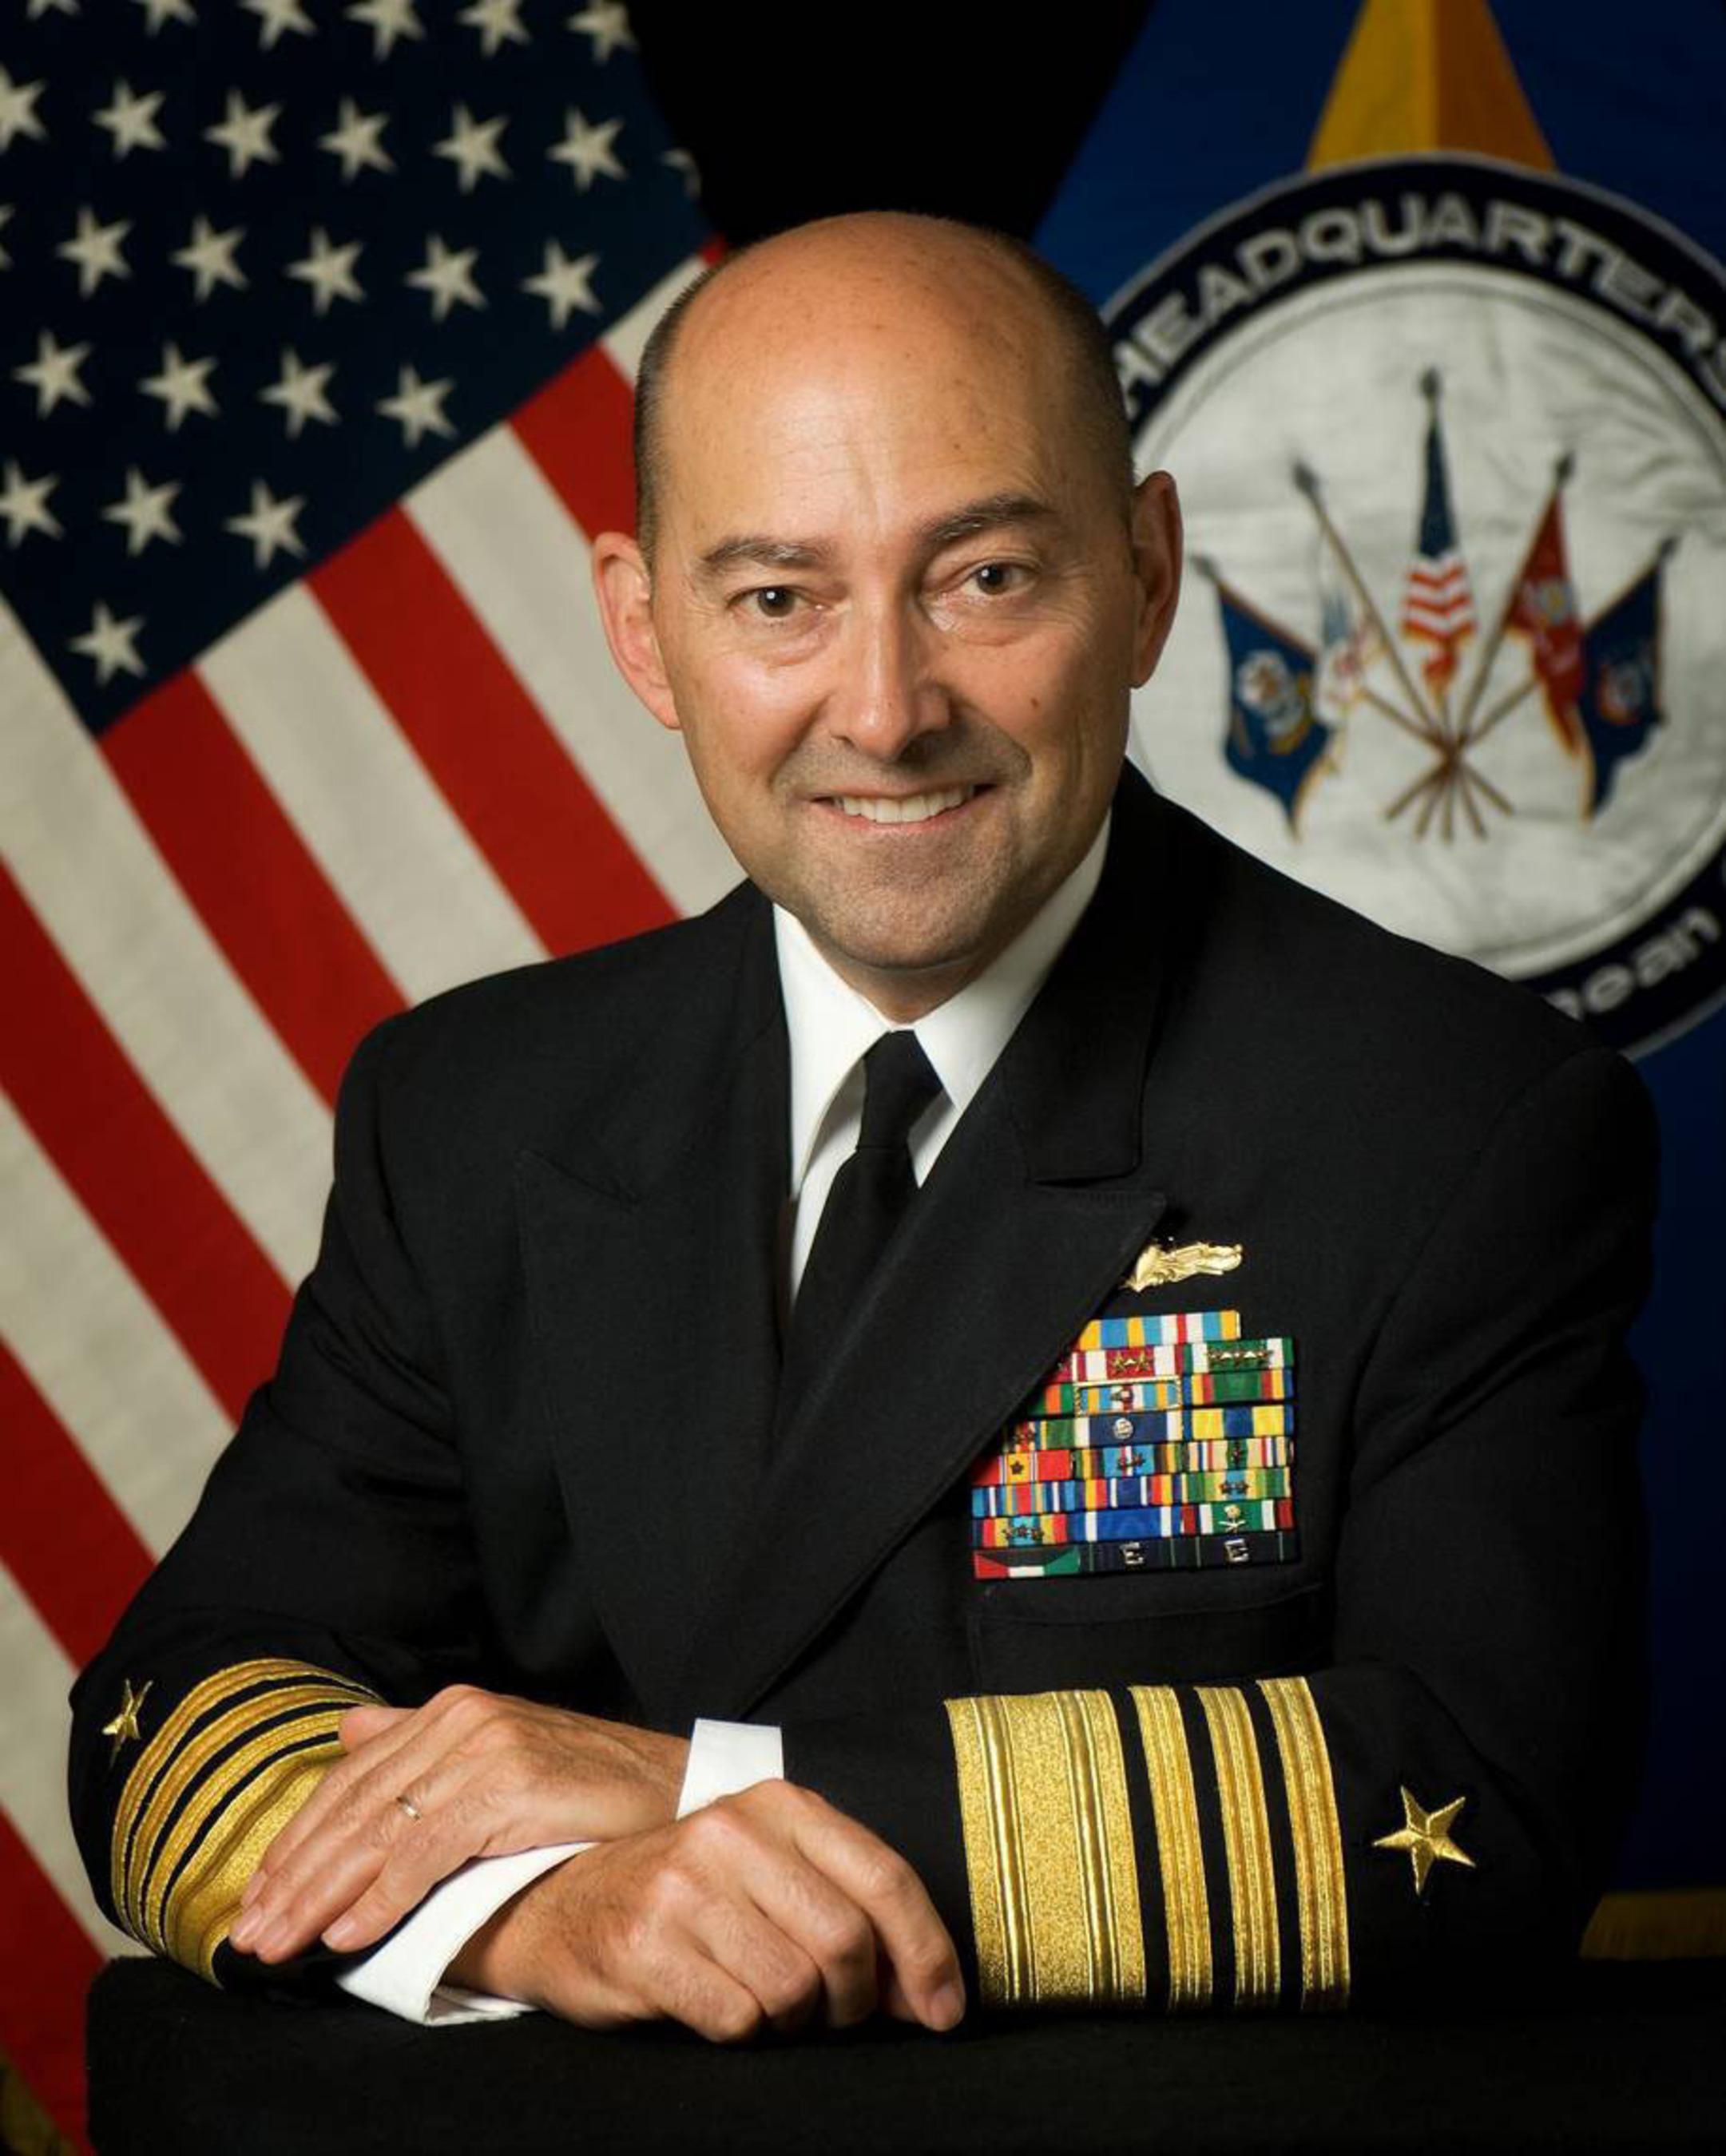 Former NATO Supreme Commander Adm. James Stavridis, USN (Ret.) Joins Thinklogical Defense and Intelligence Advisory Board. (PRNewsFoto/Thinklogical LLC)